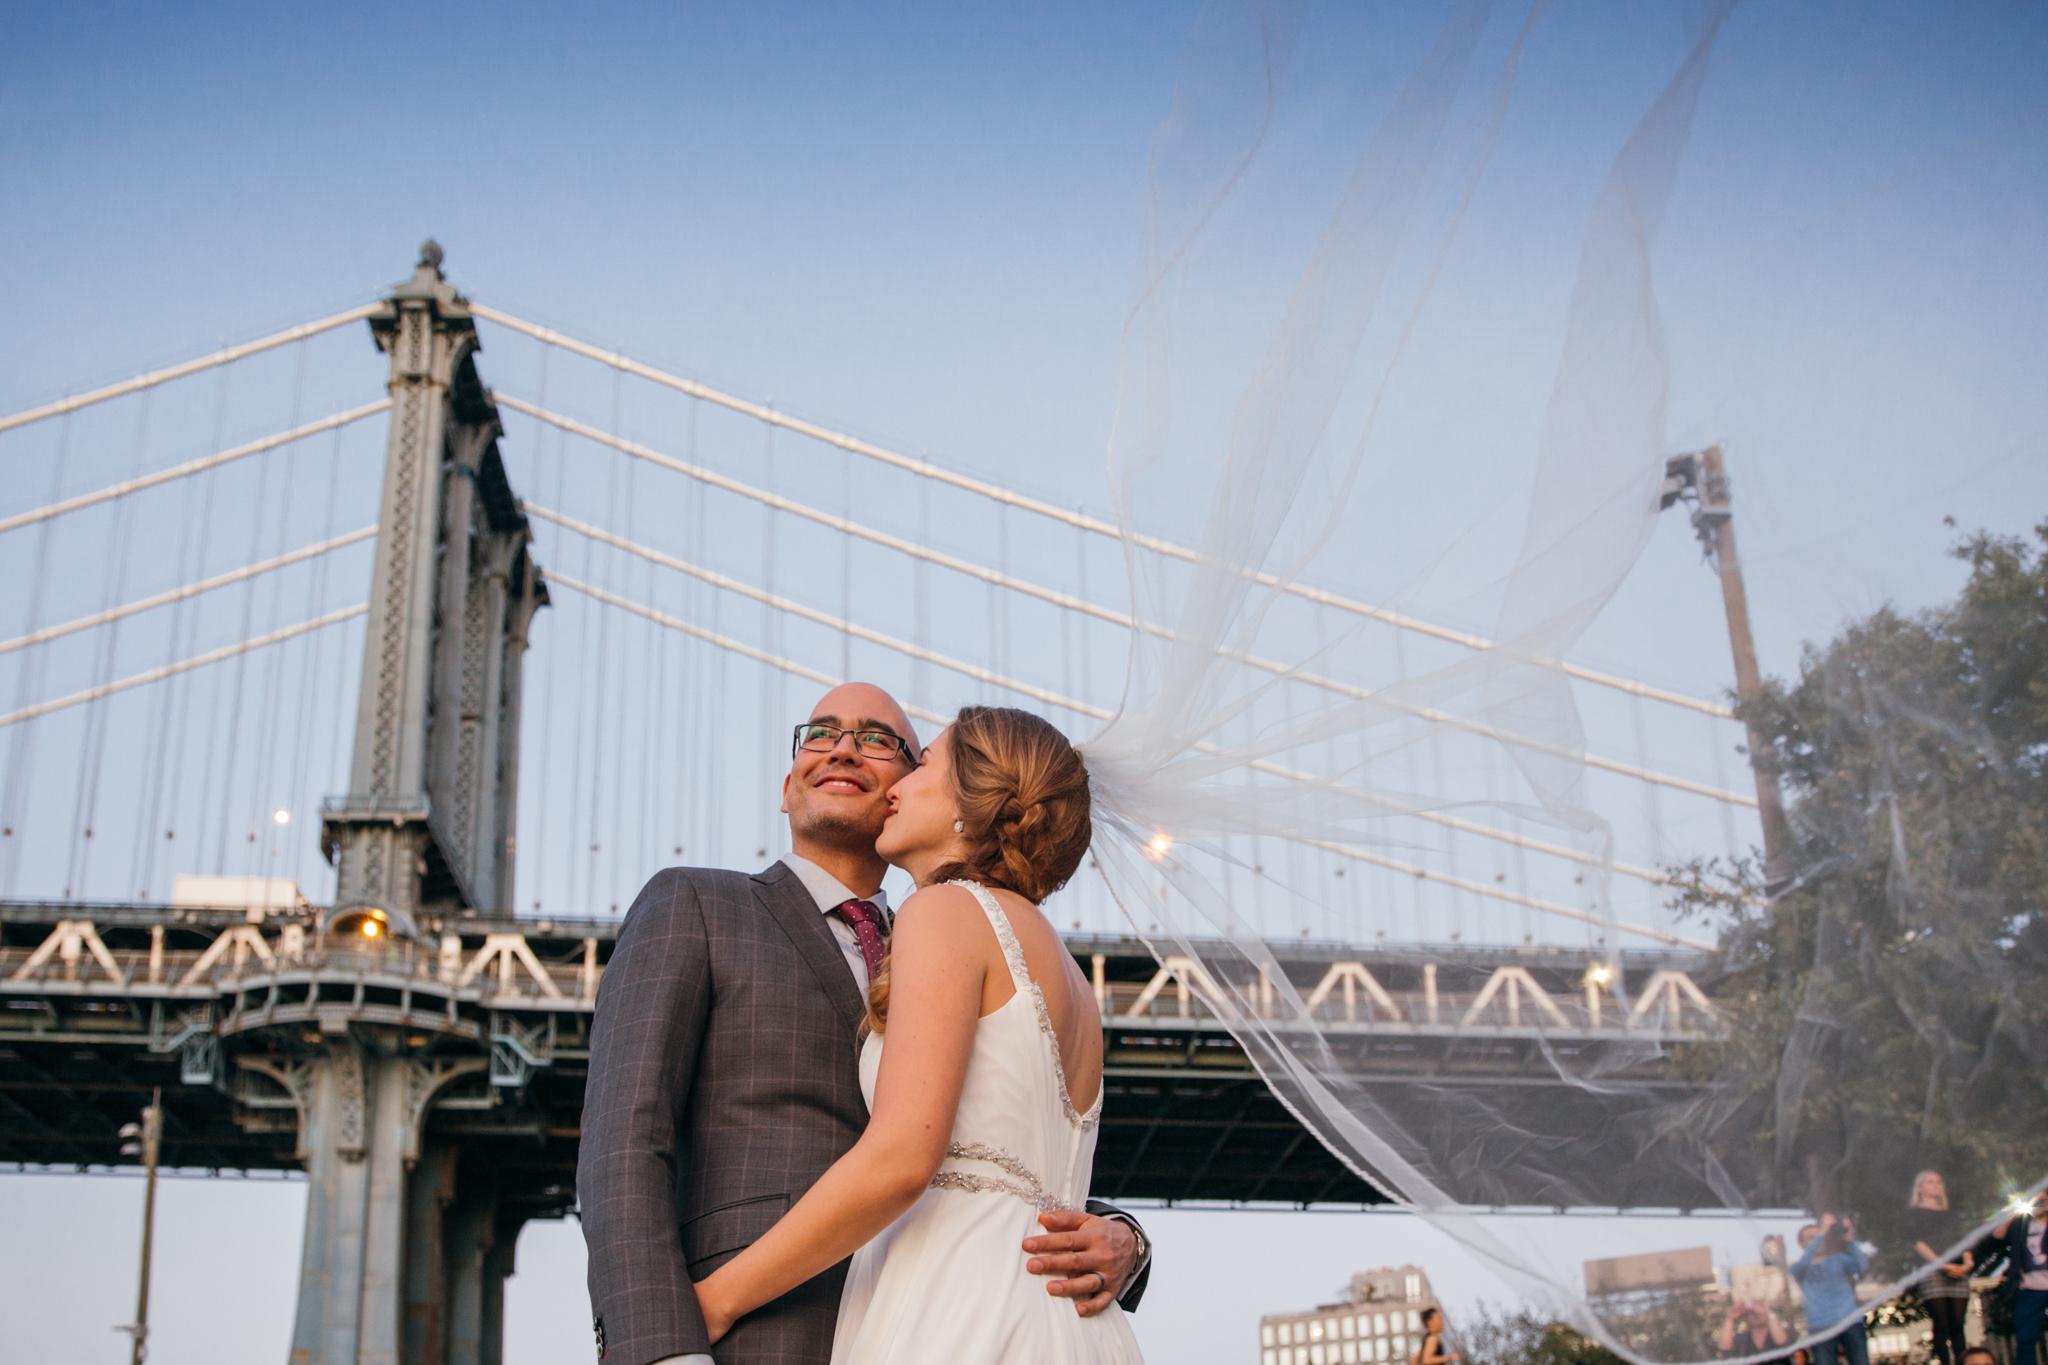 Wedding_VC_web-144.jpg